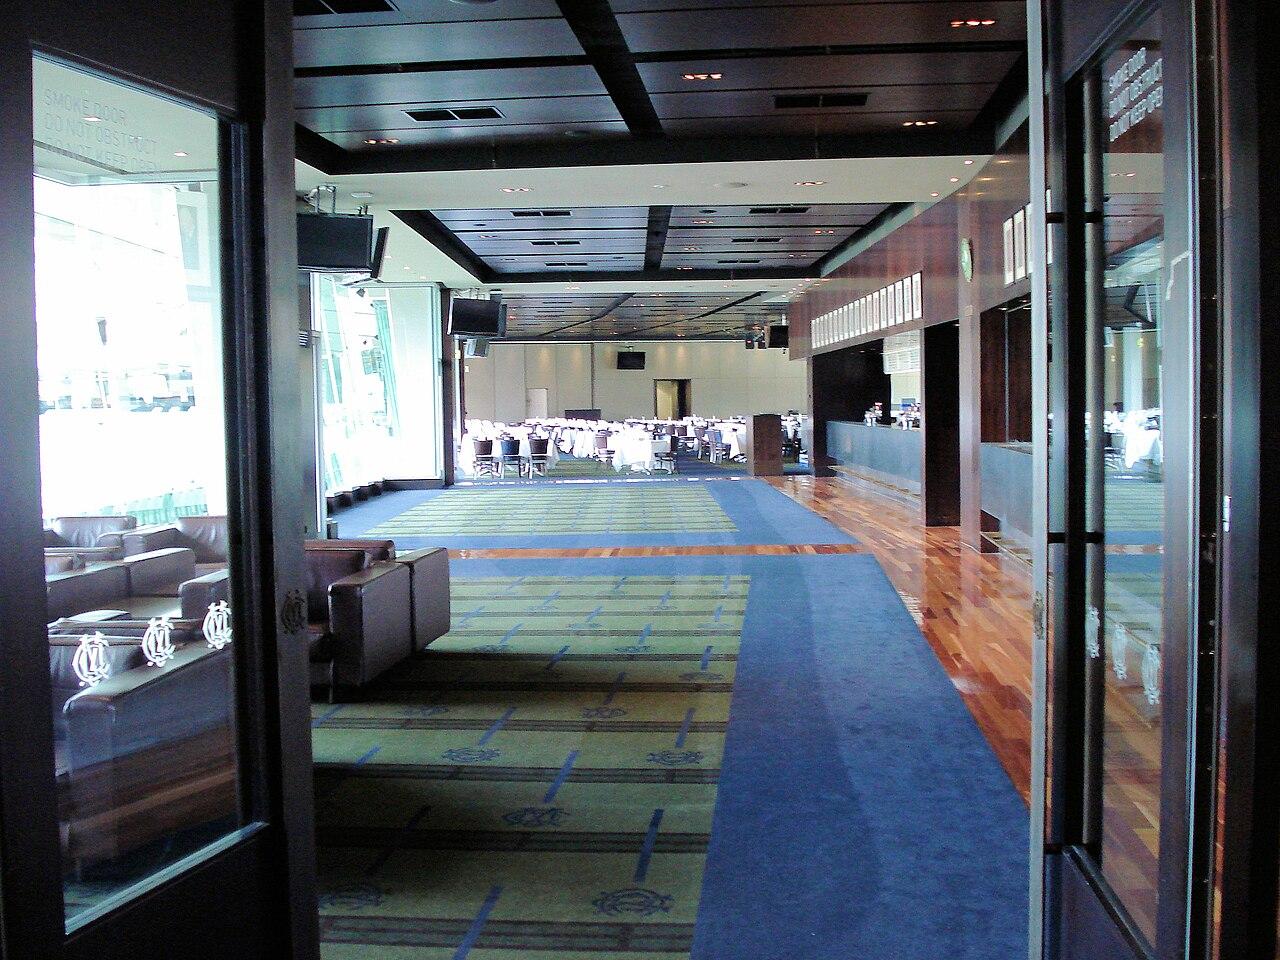 File:Members dining room MCG 1.JPG - Wikimedia Commons